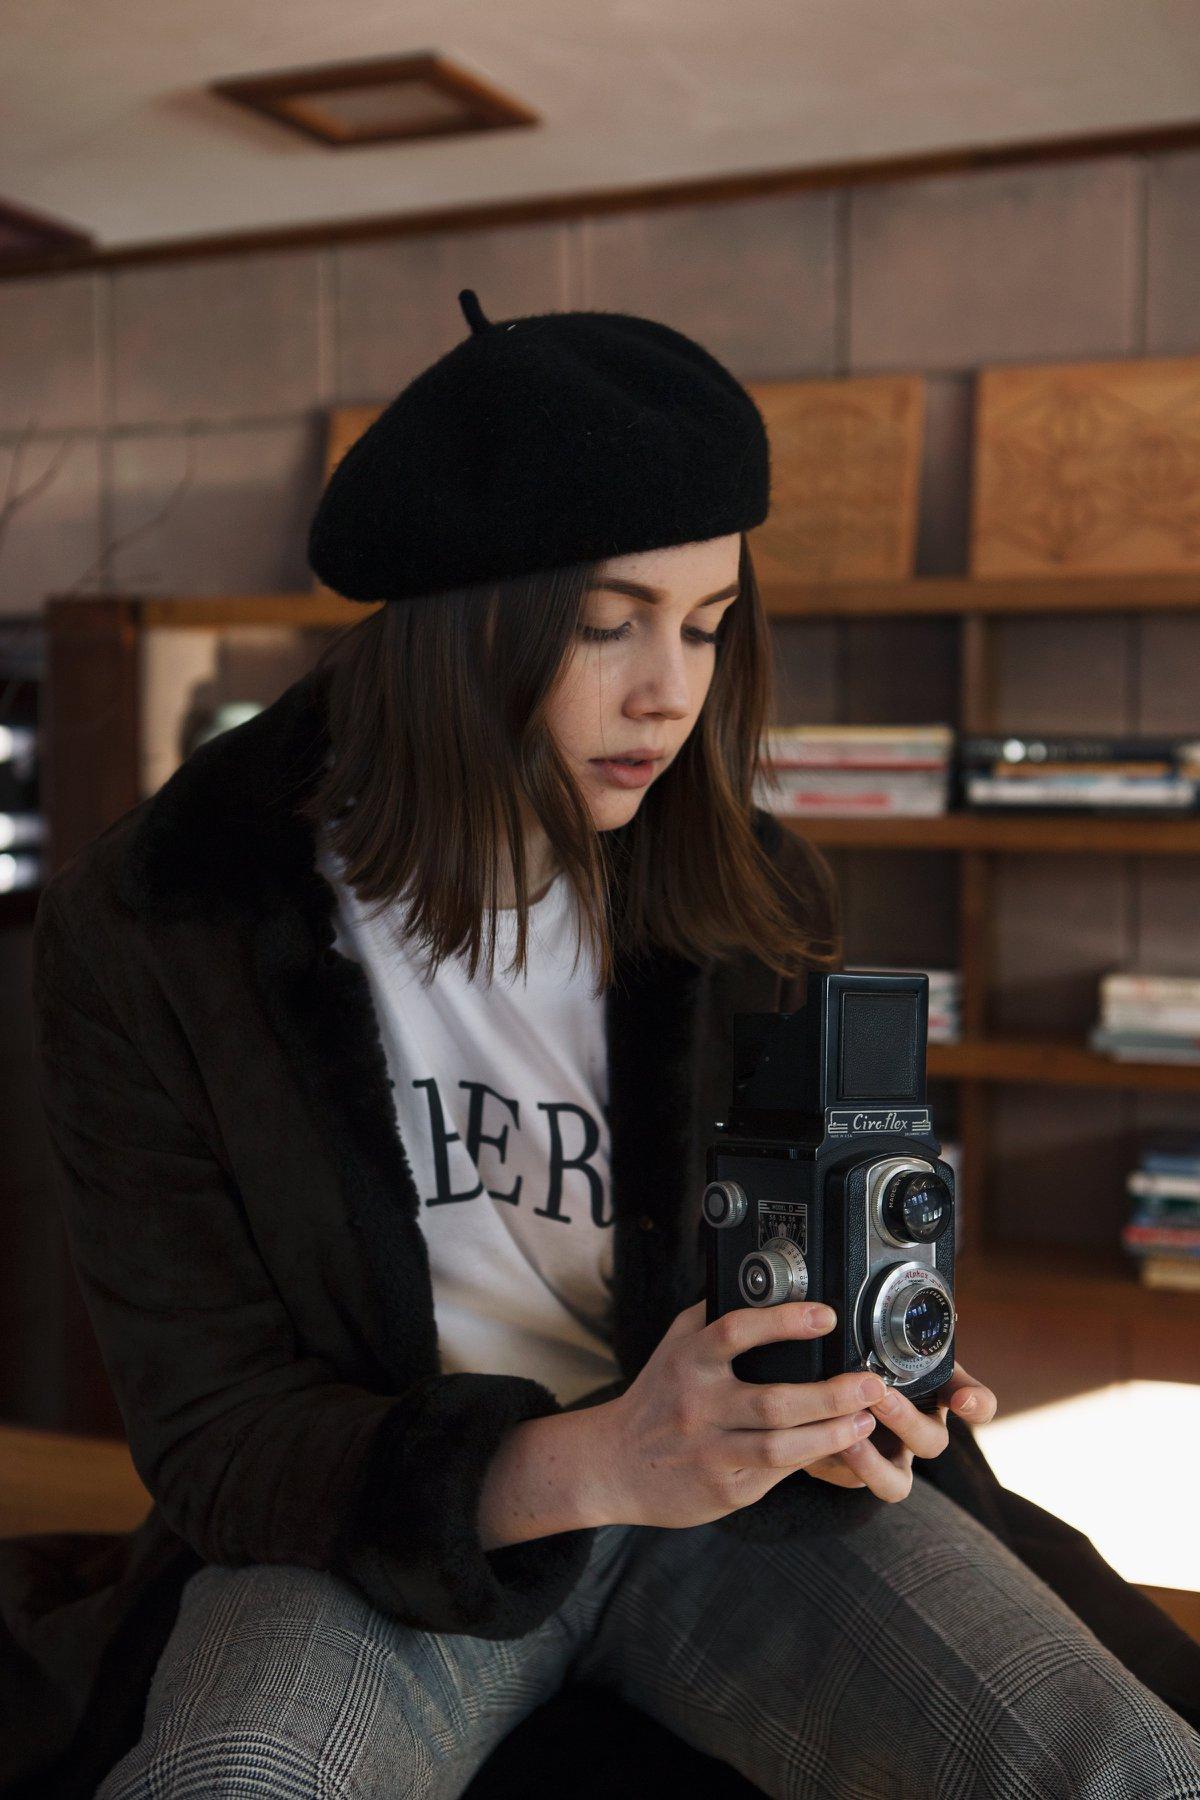 fur coat fashion portrait eppsetin house frank lloyd wright midcentury modern vintage camera beret